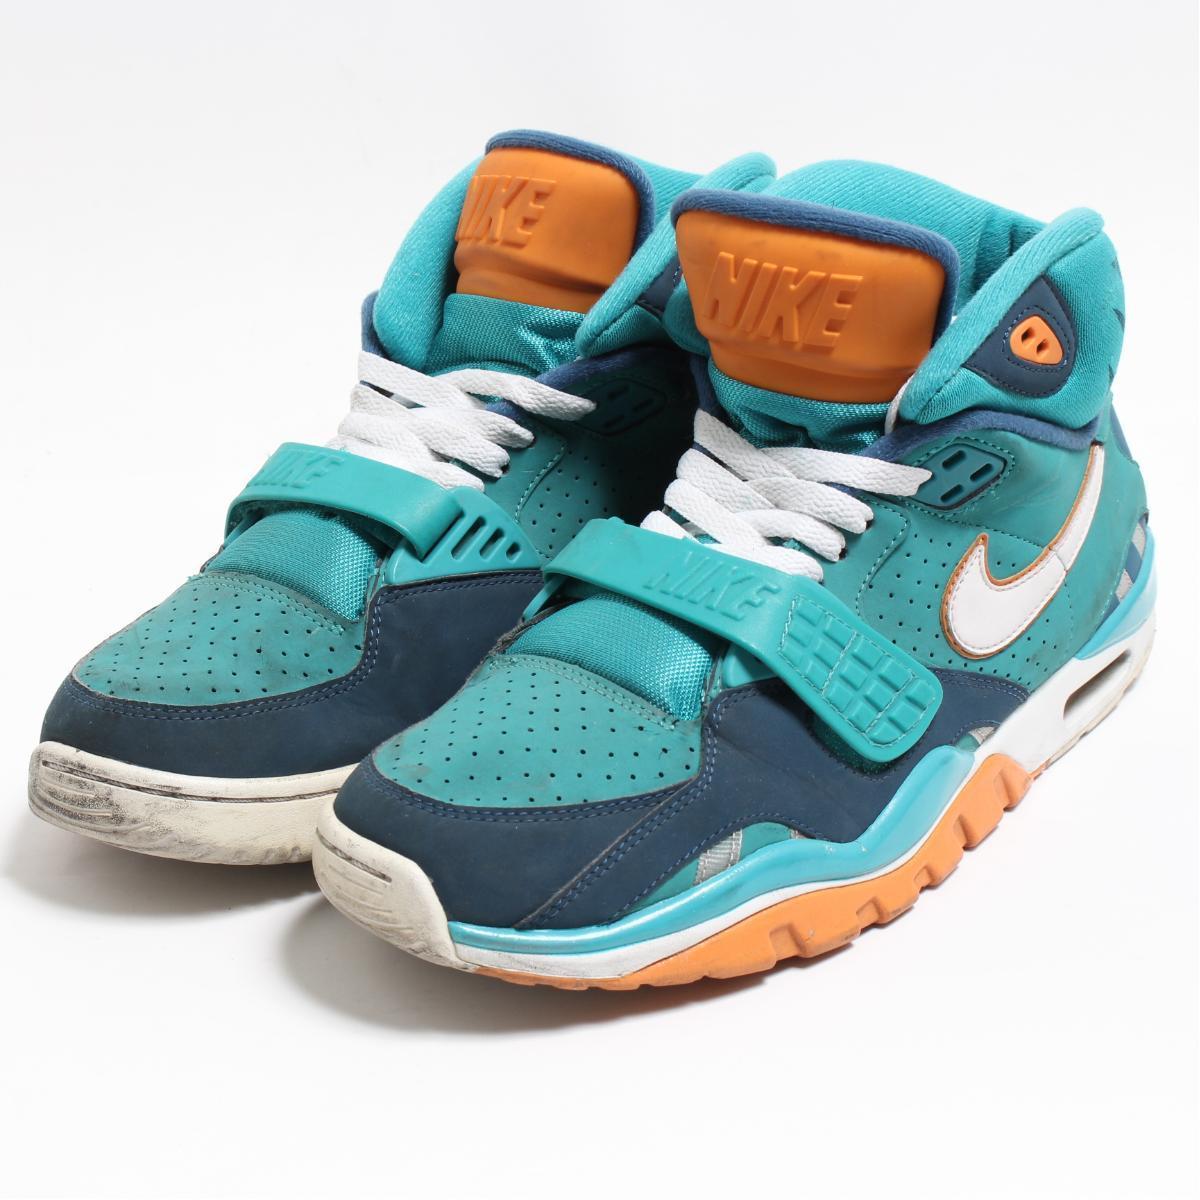 online store 5211a 4b3cb Nike NIKE AIR TRAINER SC 2 sneakers US10 men 28.0cm bon4892